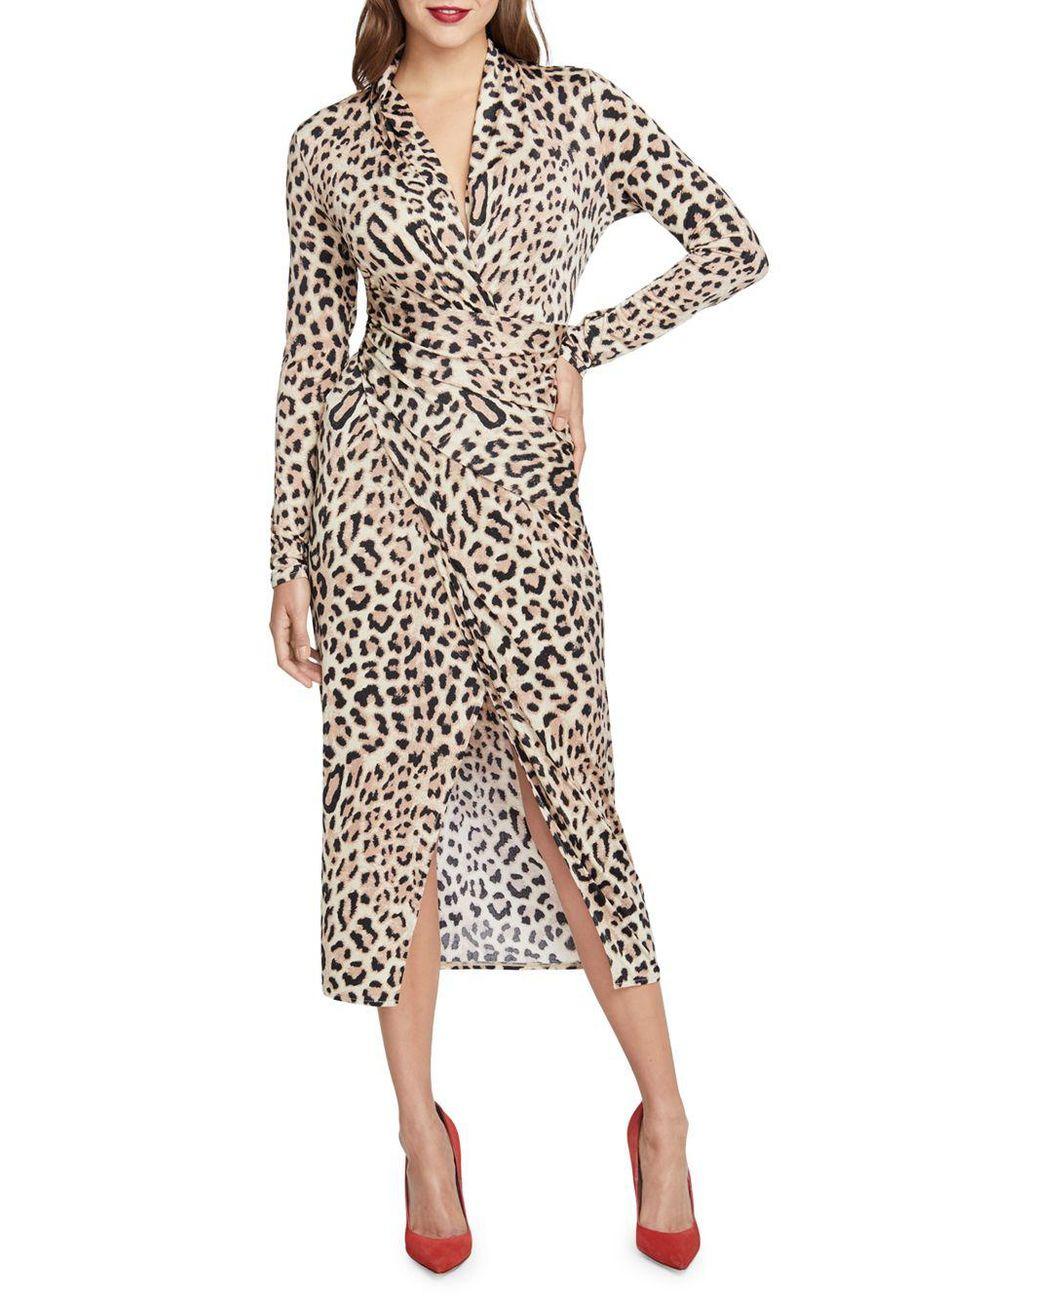 9036bbfd1c602 Lyst - RACHEL Rachel Roy Bret Dress in Black - Save 63%